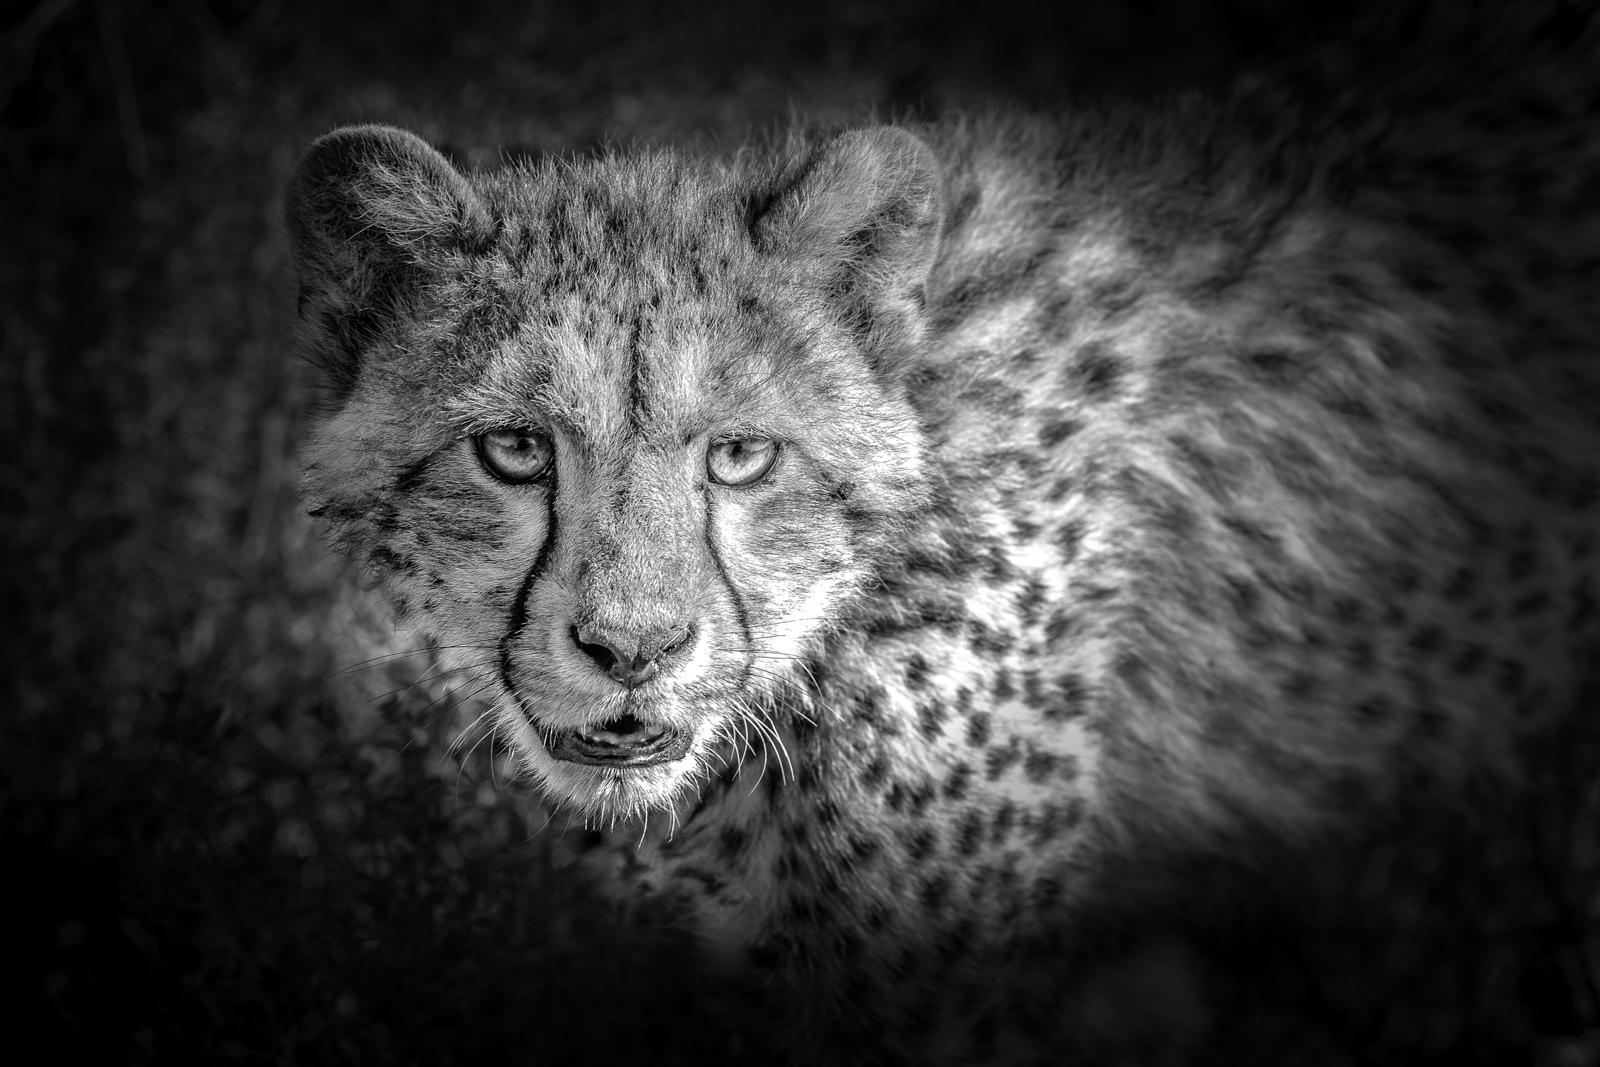 Julie_Eliason_Expressions_and_Impressions_Cheetah's_Gaze_03.jpg